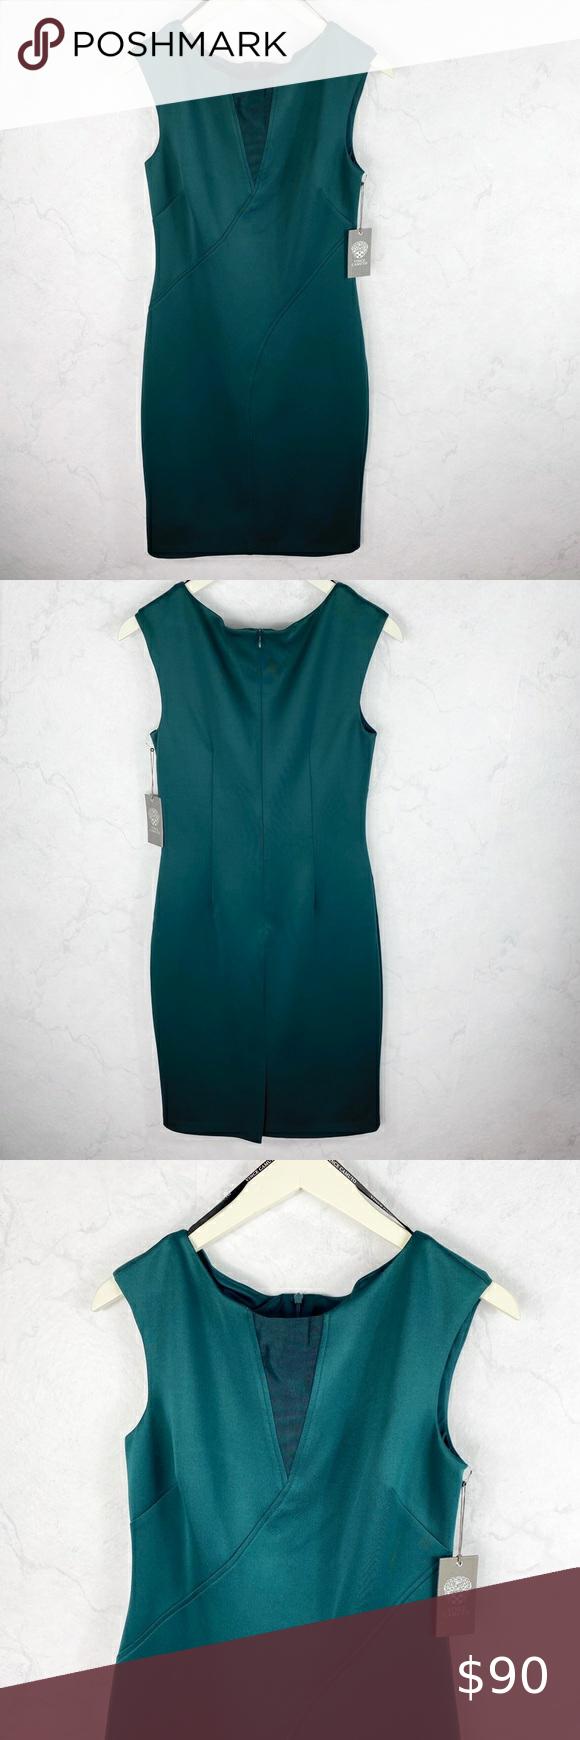 Vince Camuto Mesh Scuba Sheath Dress In 2020 Sheath Dress Clothes Design Vince Camuto Dress [ 1740 x 580 Pixel ]